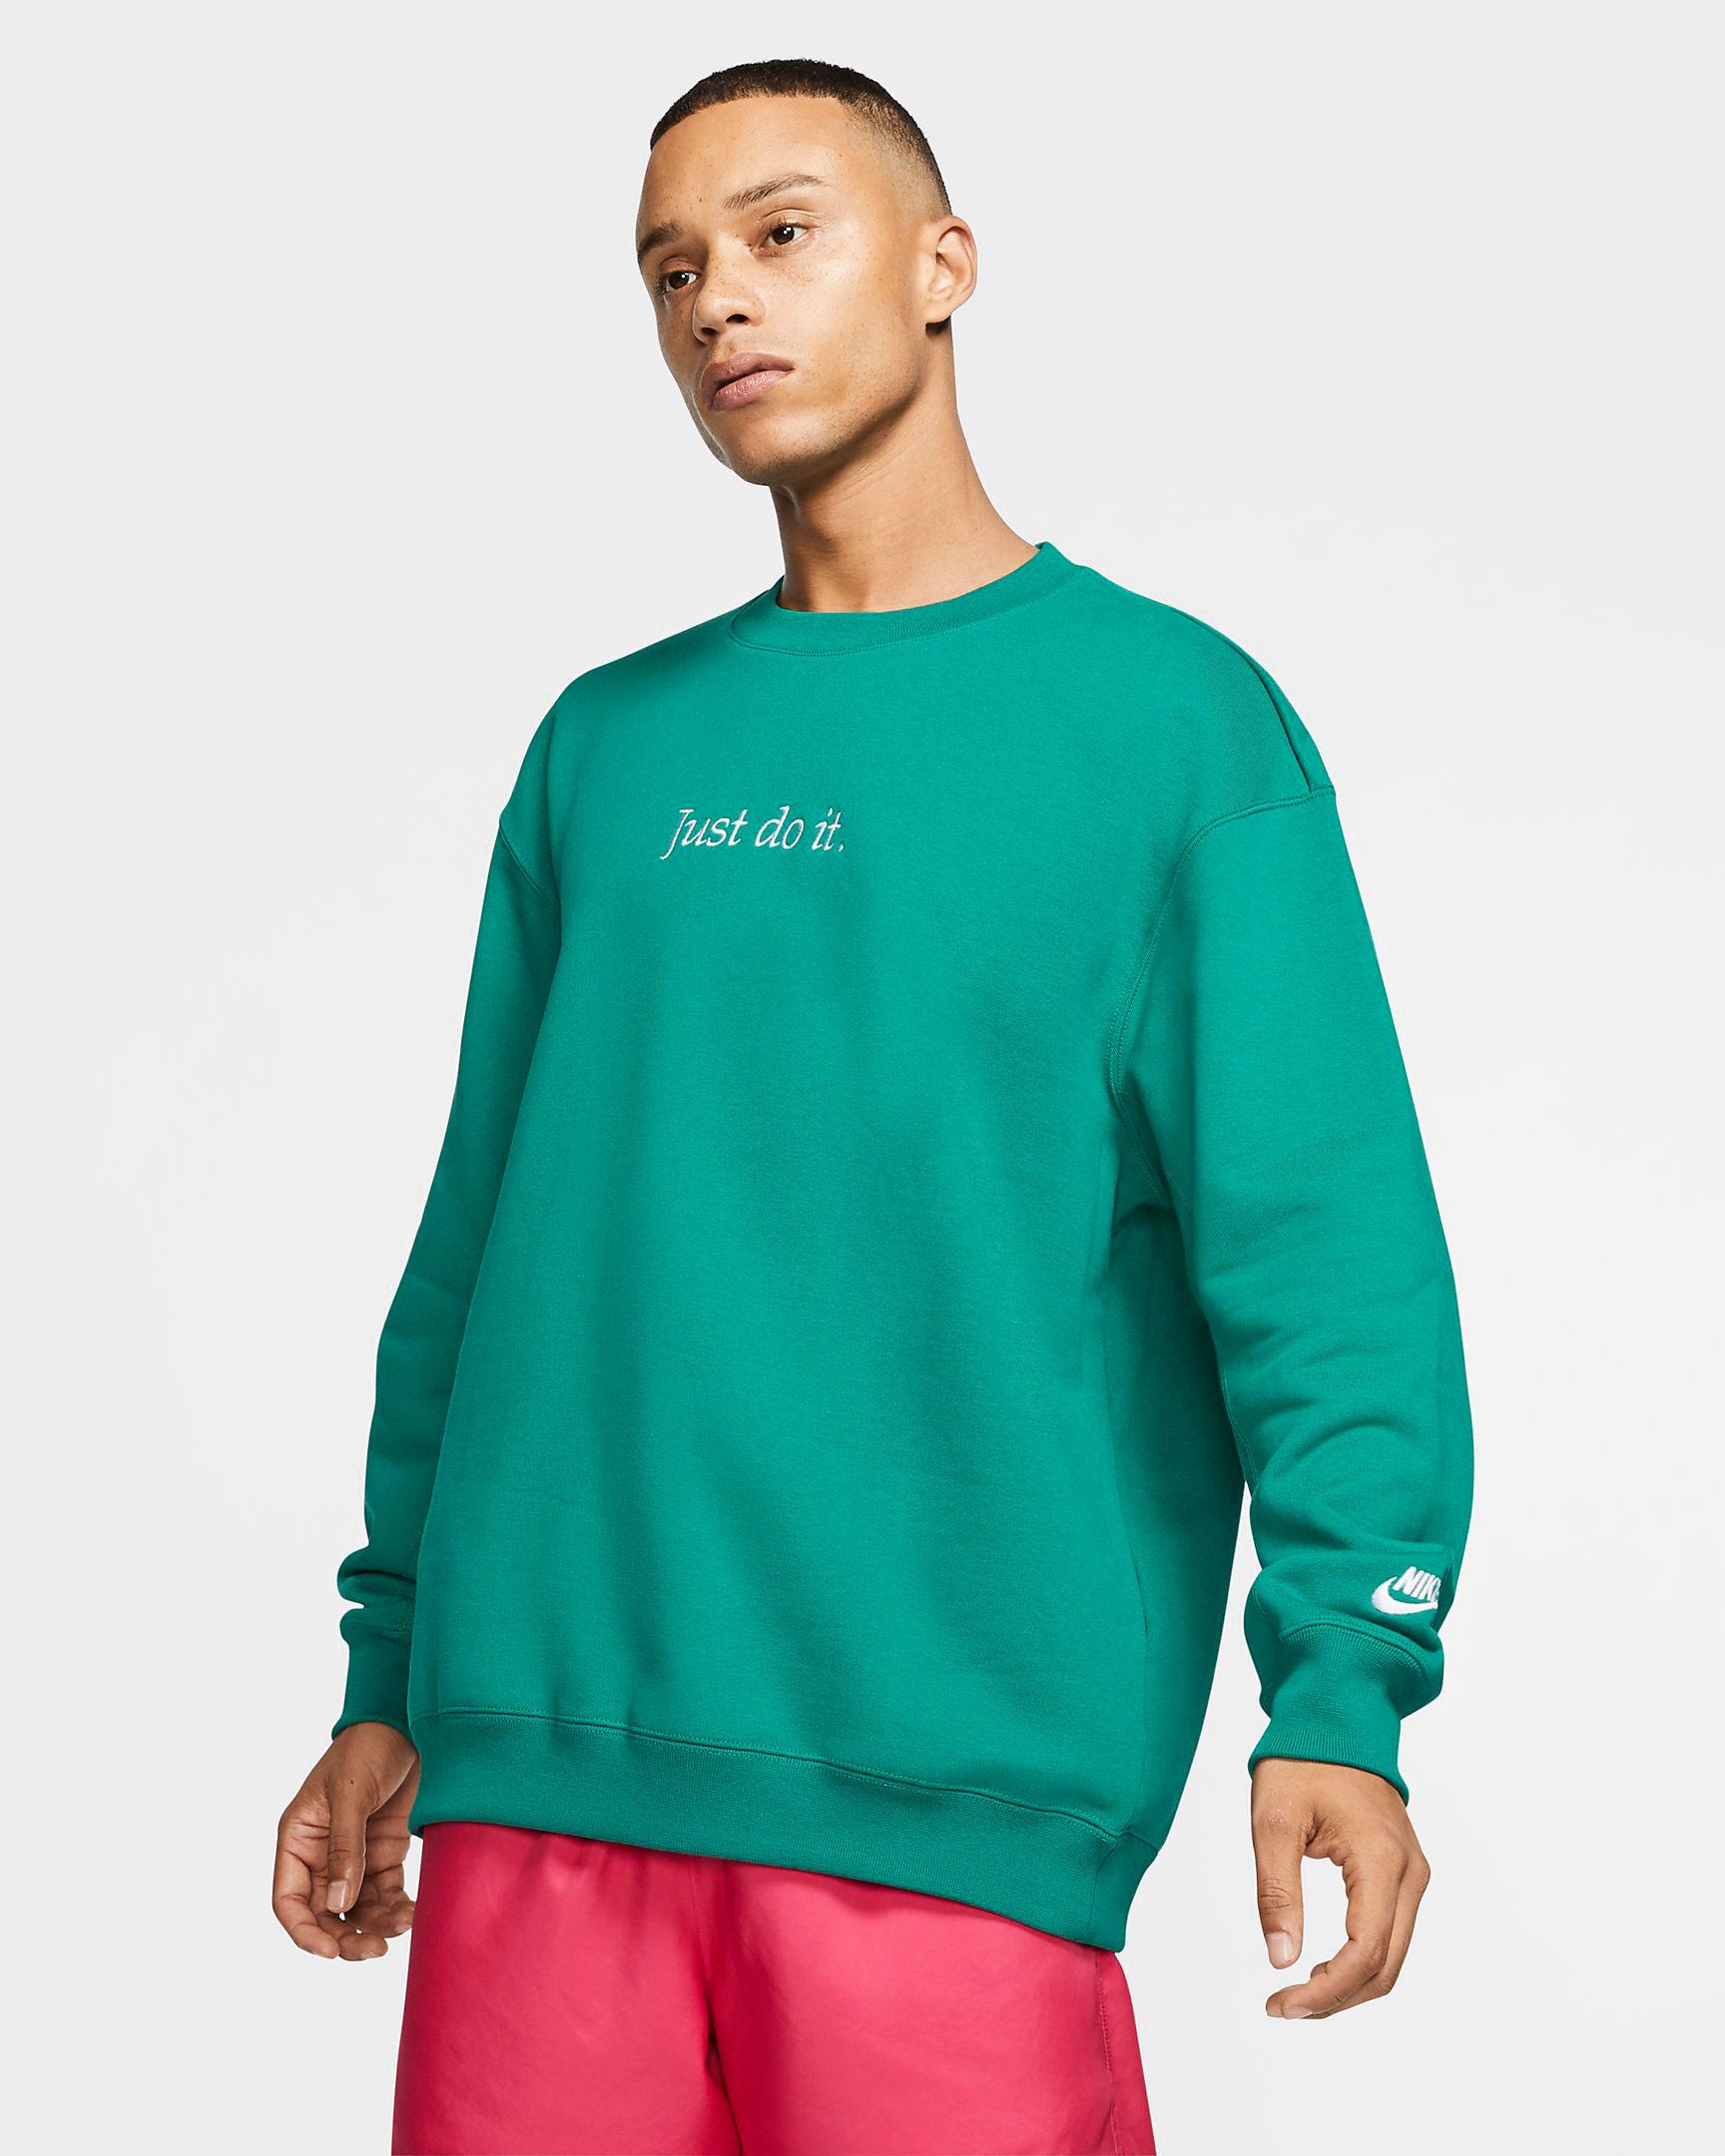 nike-island-green-just-do-it-fleece-crew-sweatshirt